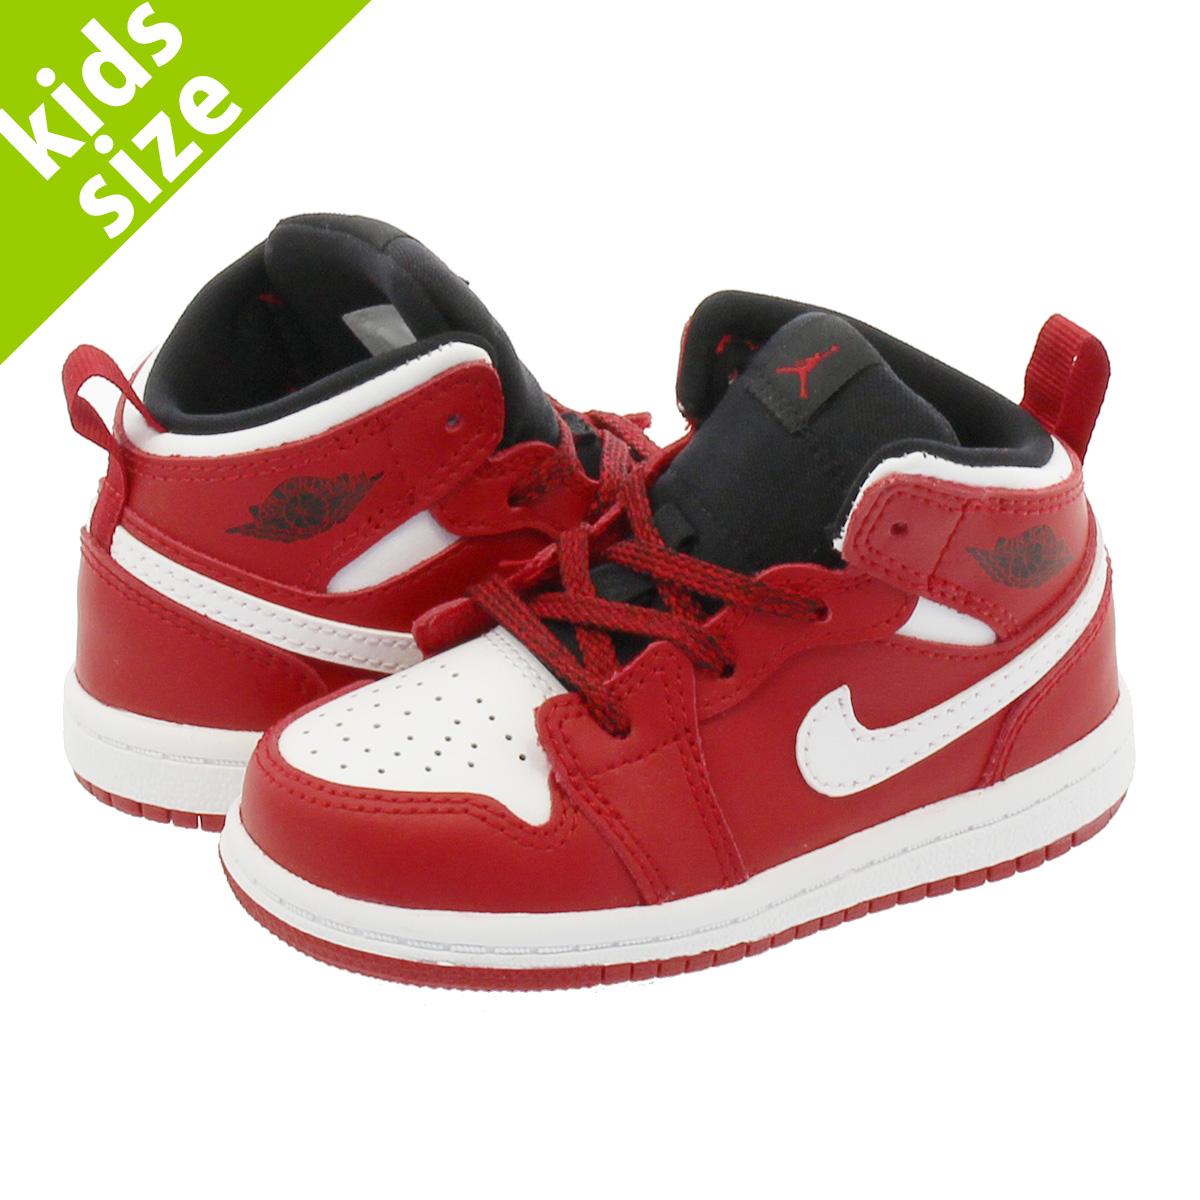 best website 273c2 2a234 NIKE AIR JORDAN 1 MID BT Nike Air Jordan 1 mid BT GYM RED/WHITE 640,735-605